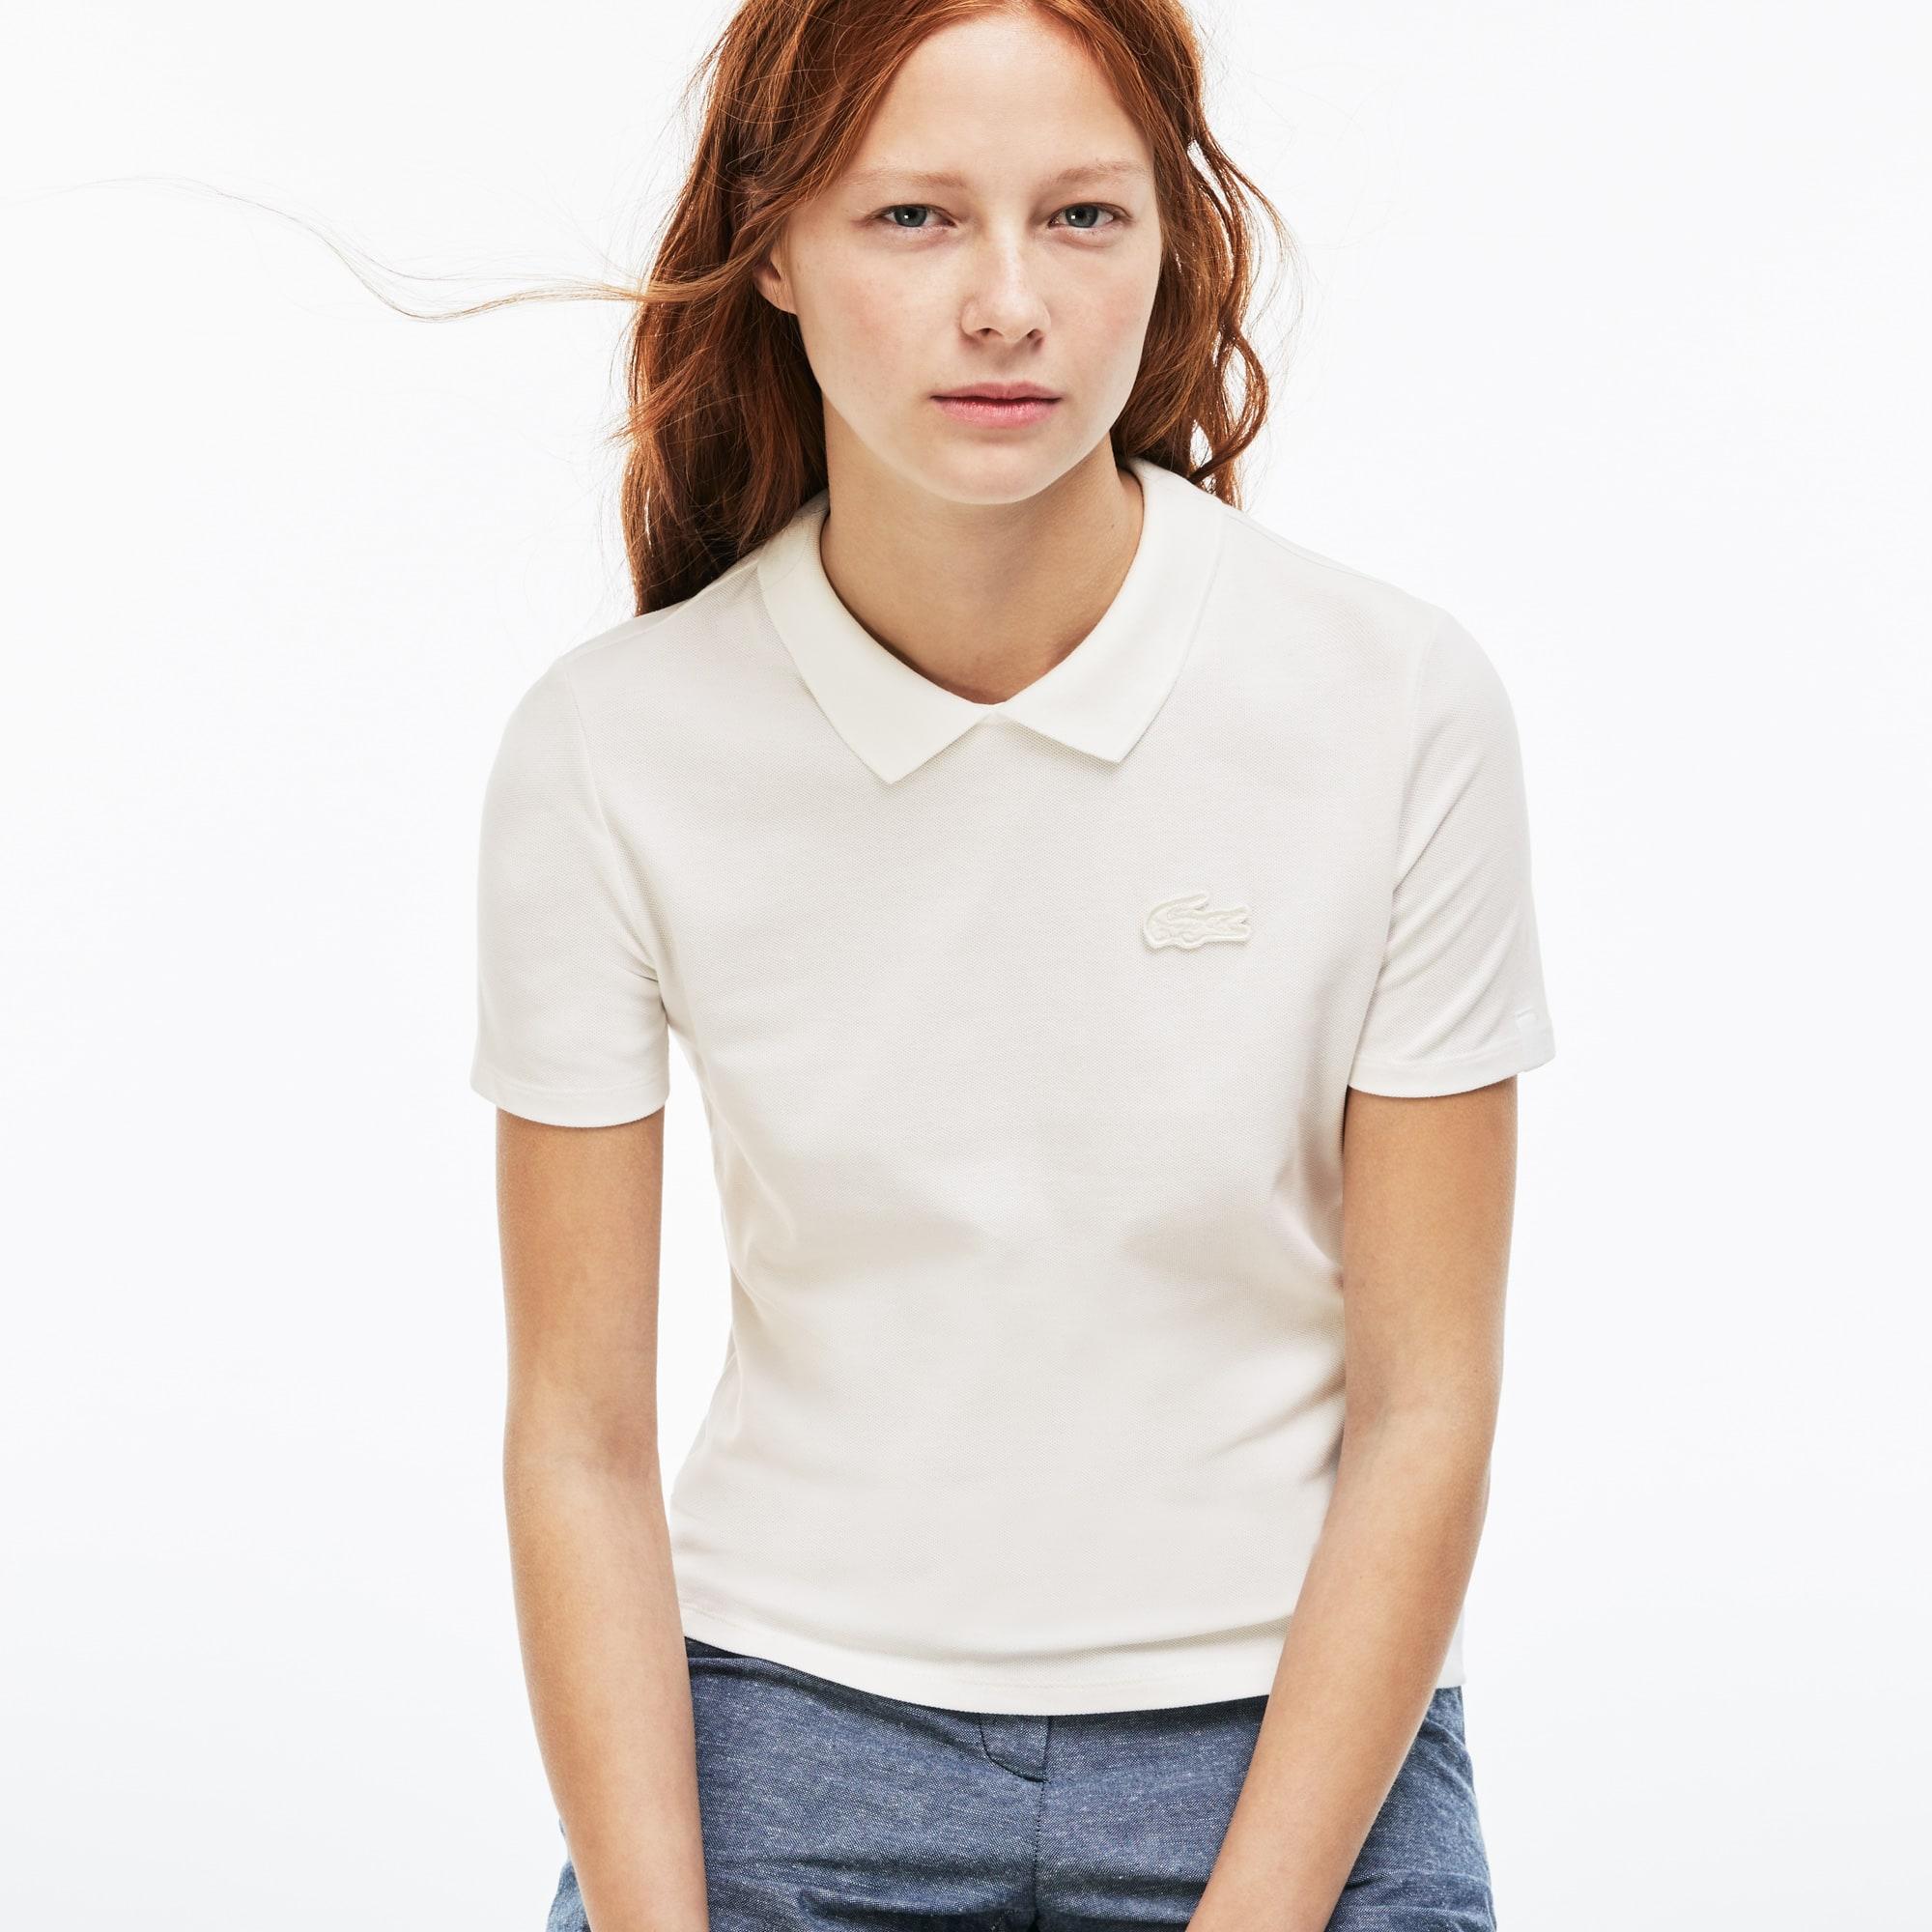 Damen-Poloshirt mit Schlüssellochausschnitt LACOSTE L!VE